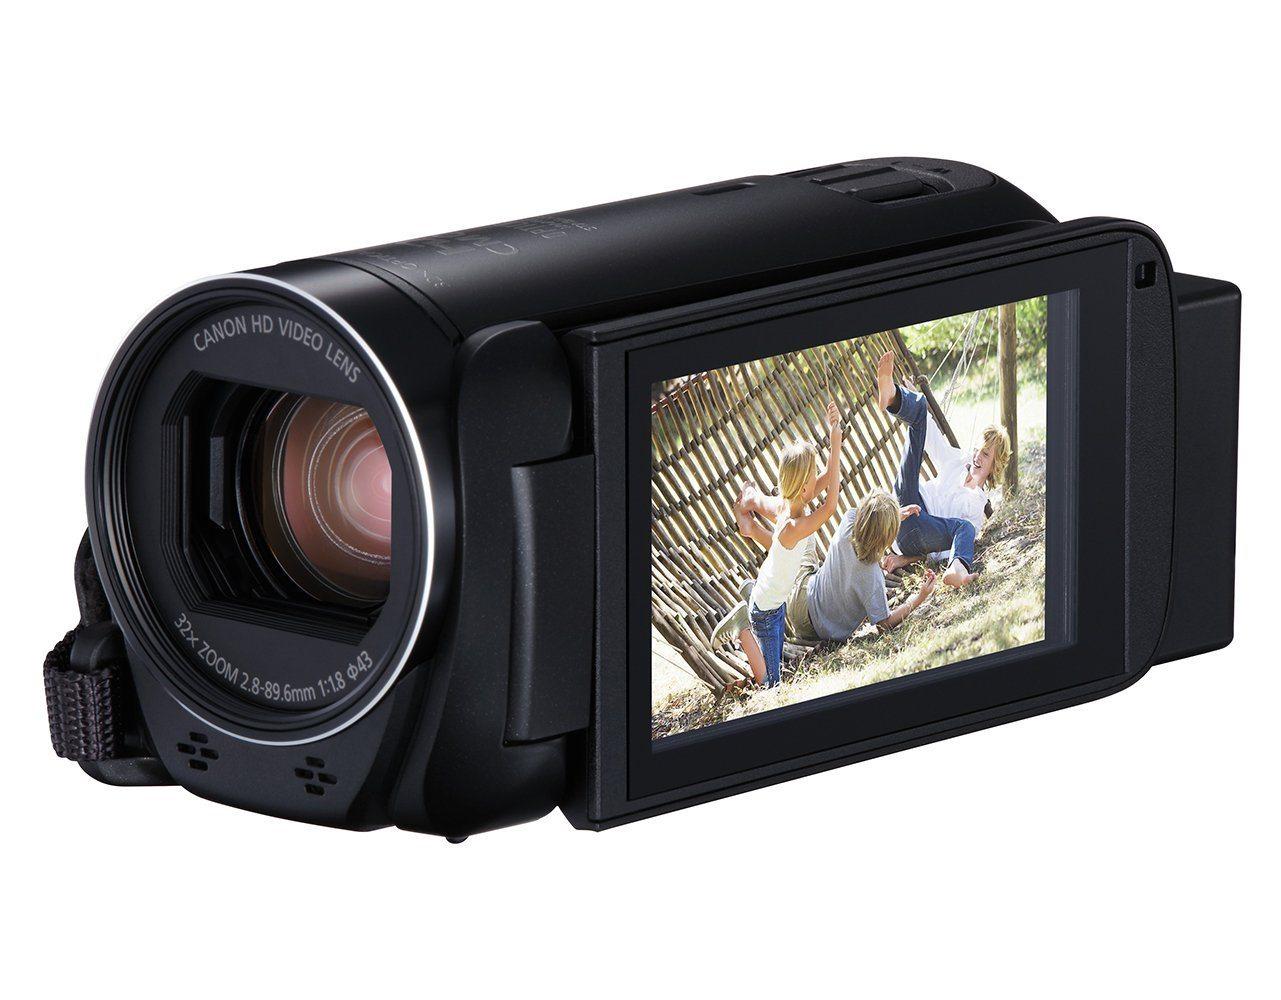 Canon Legria HF R806 Gamescom Camcorder Text